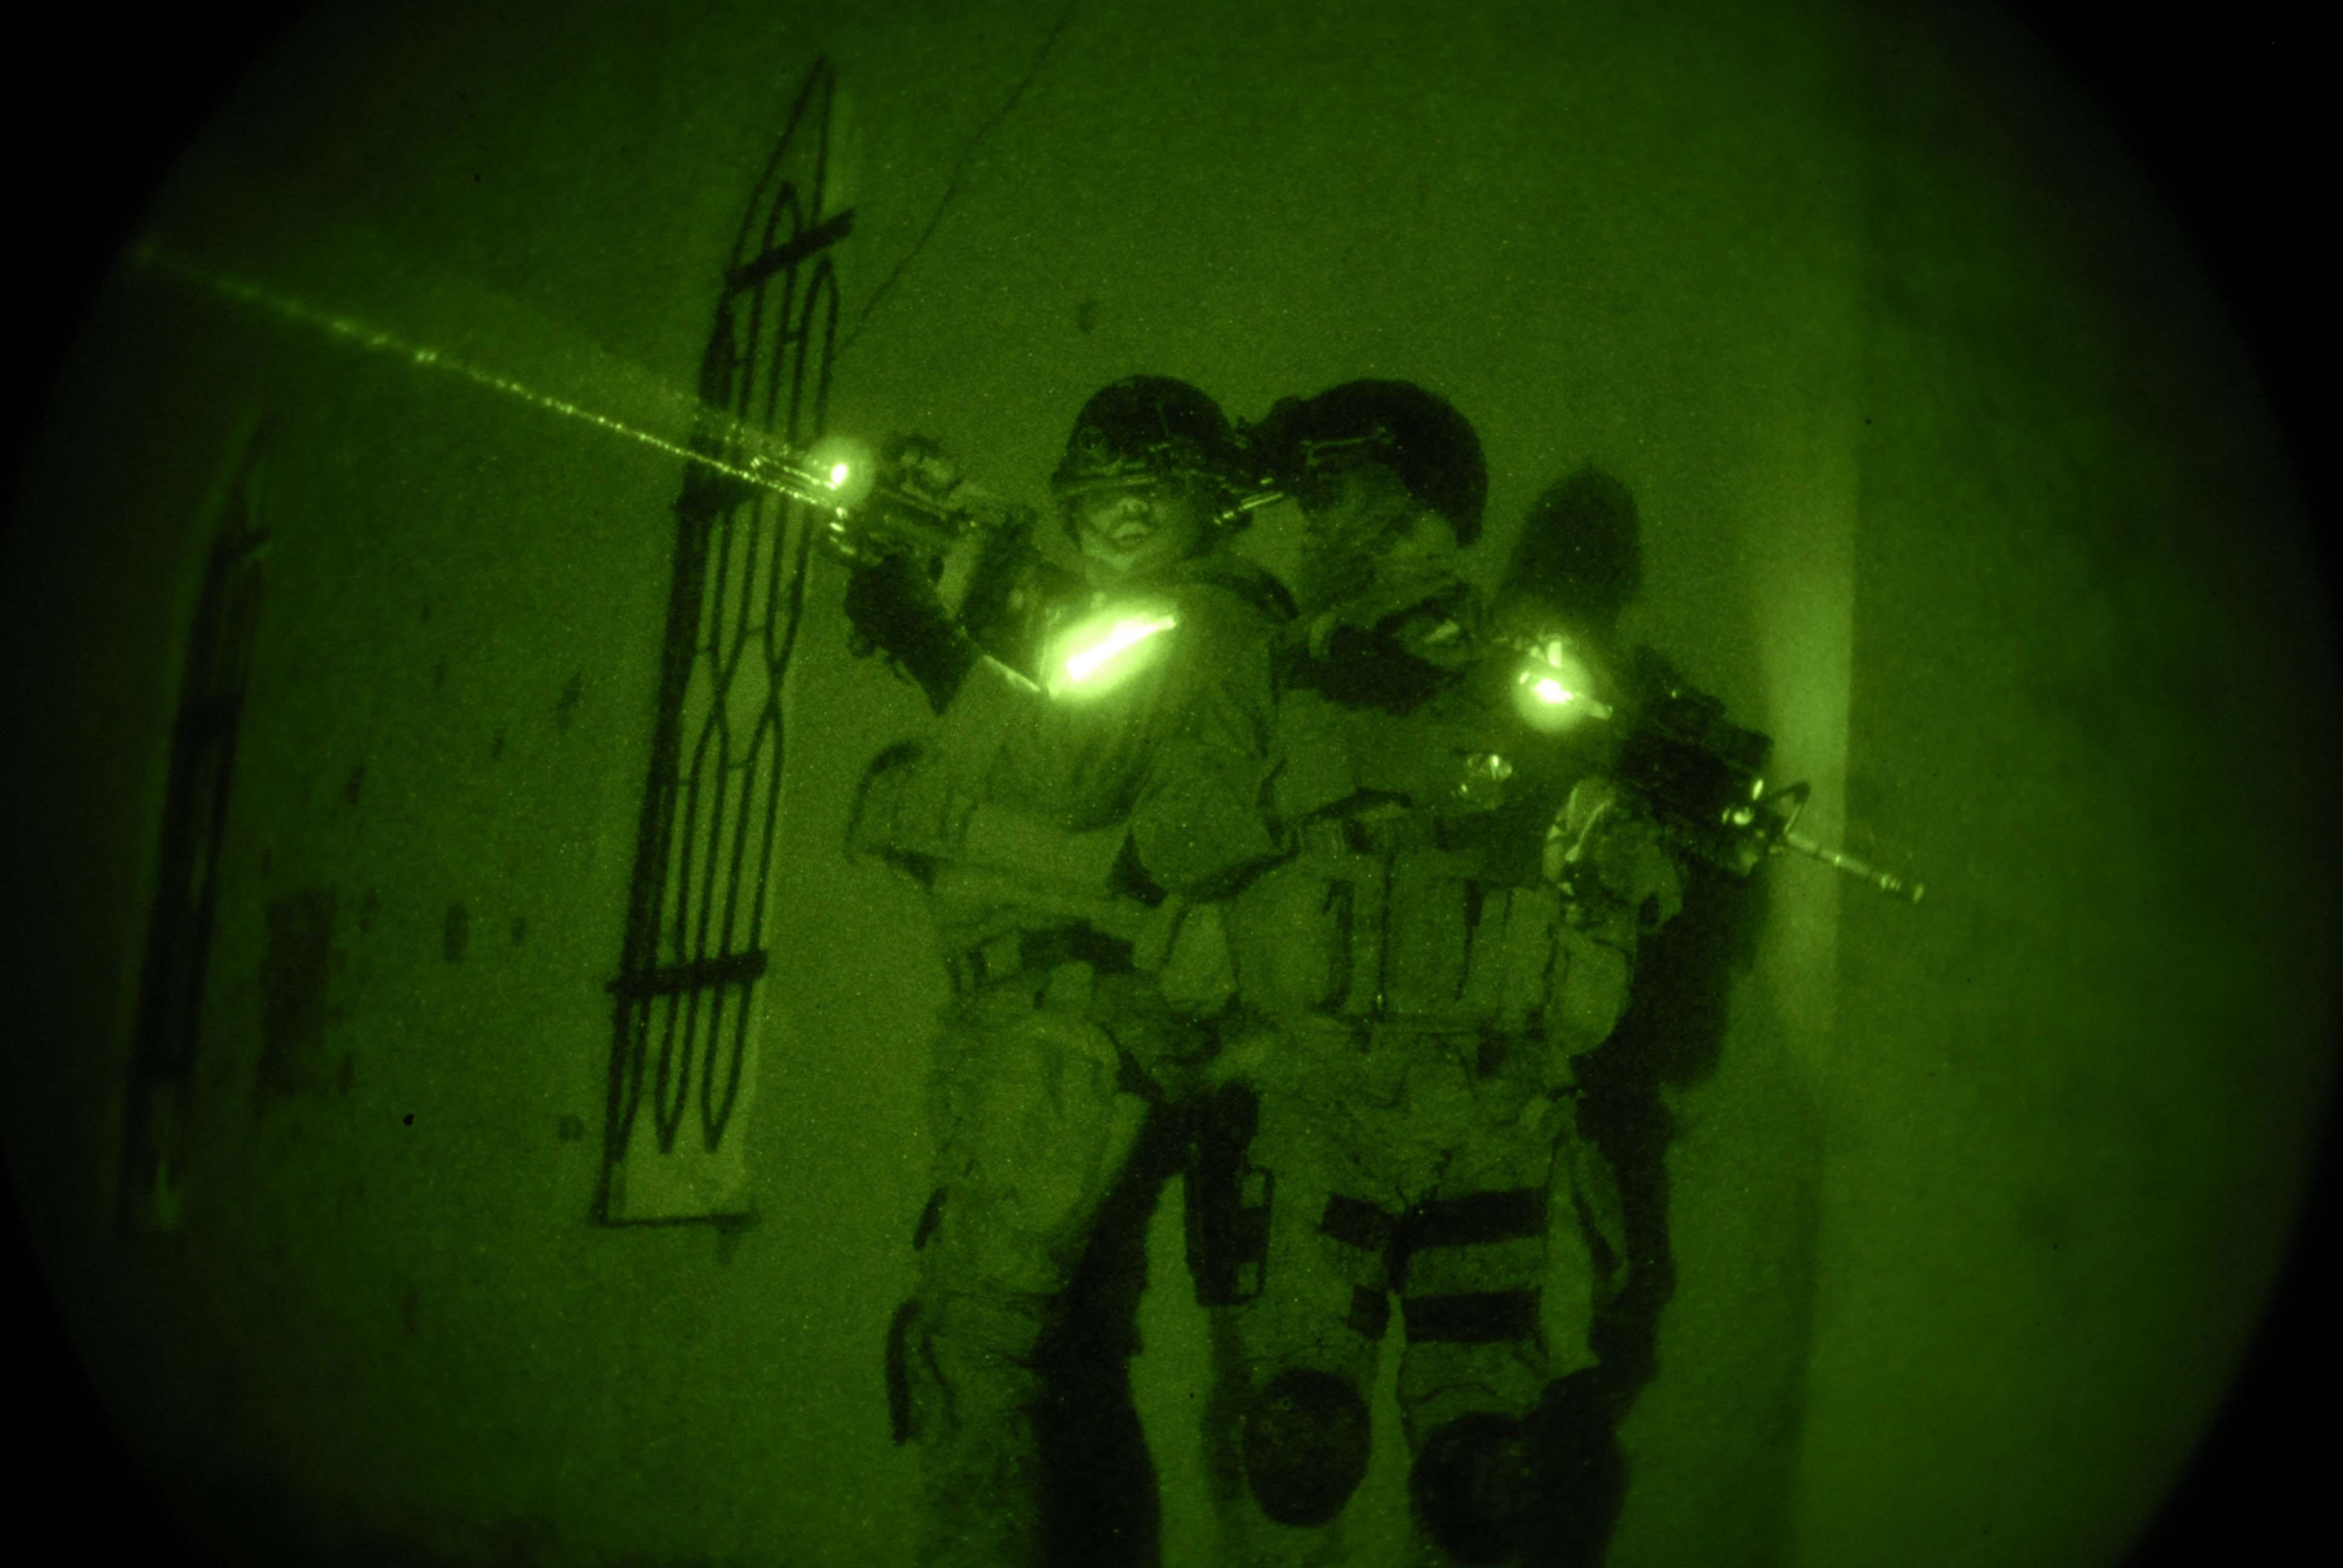 (U.S. Navy photo by Mass Communication Specialist 1st Class Michael B.W. Watkins)